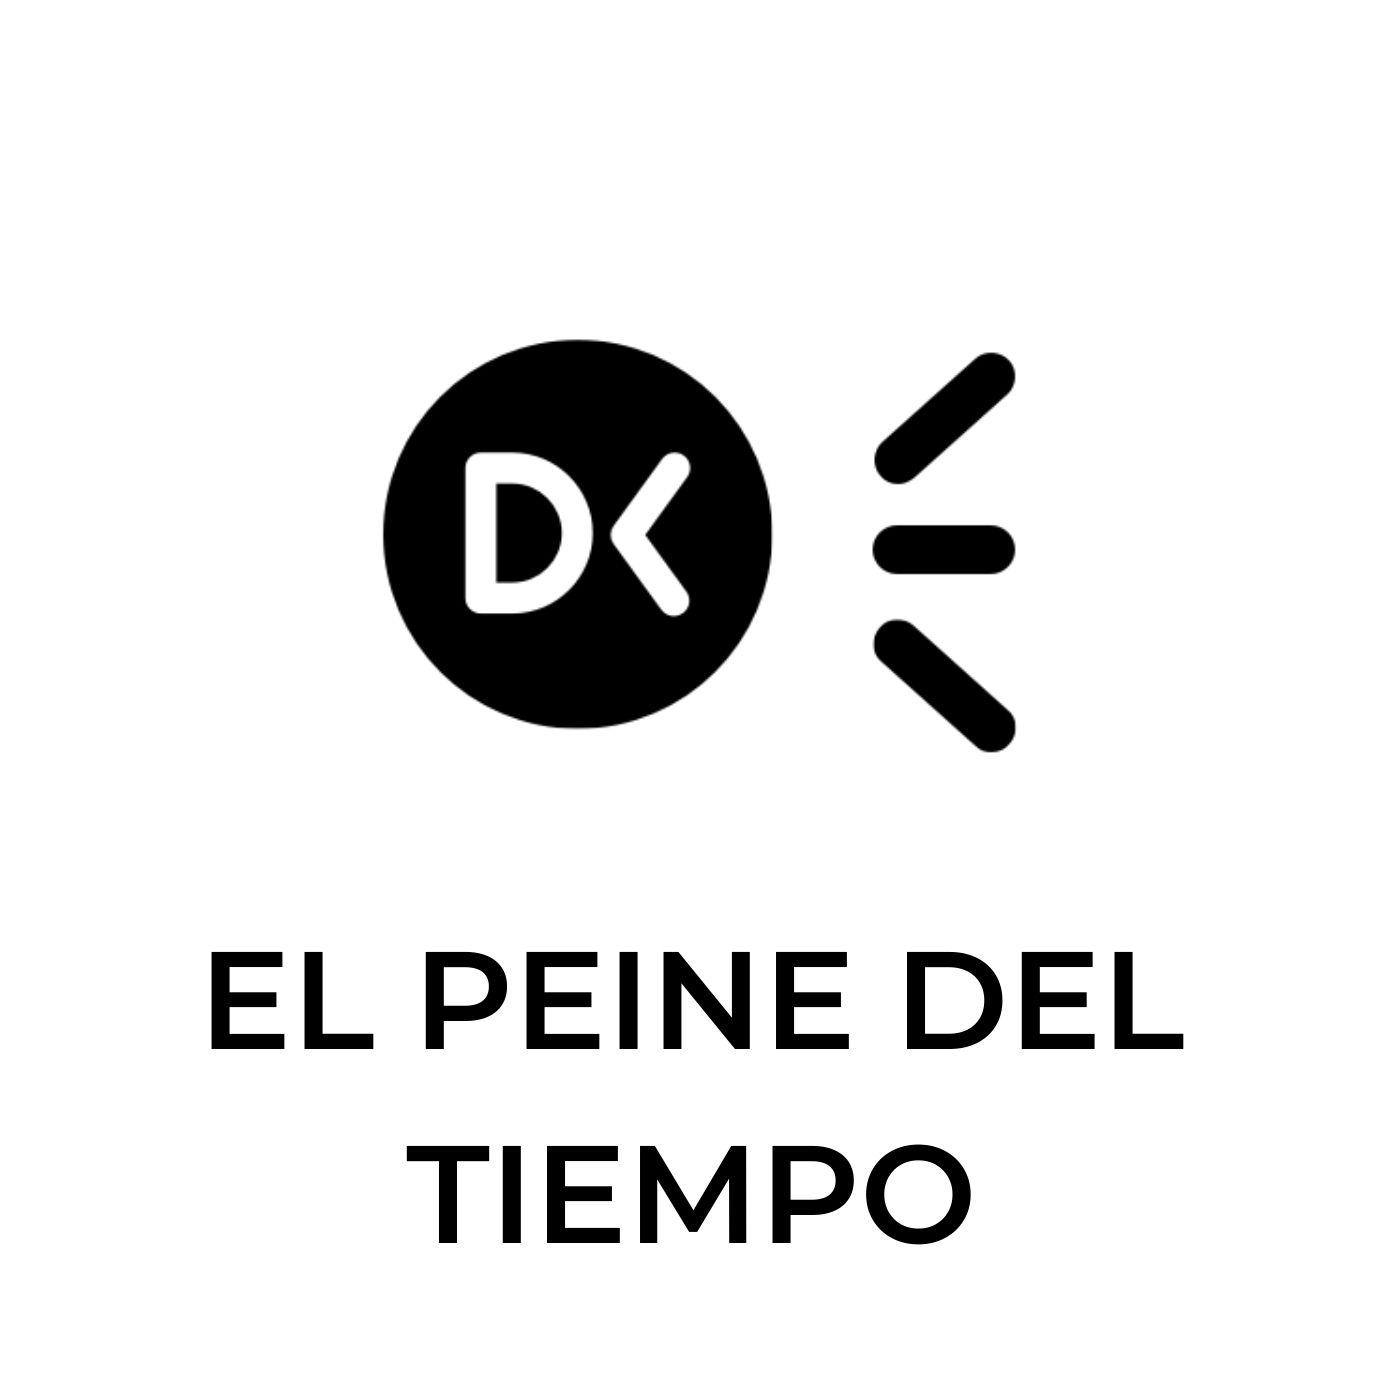 Artwork for podcast El Peine del Tiempo